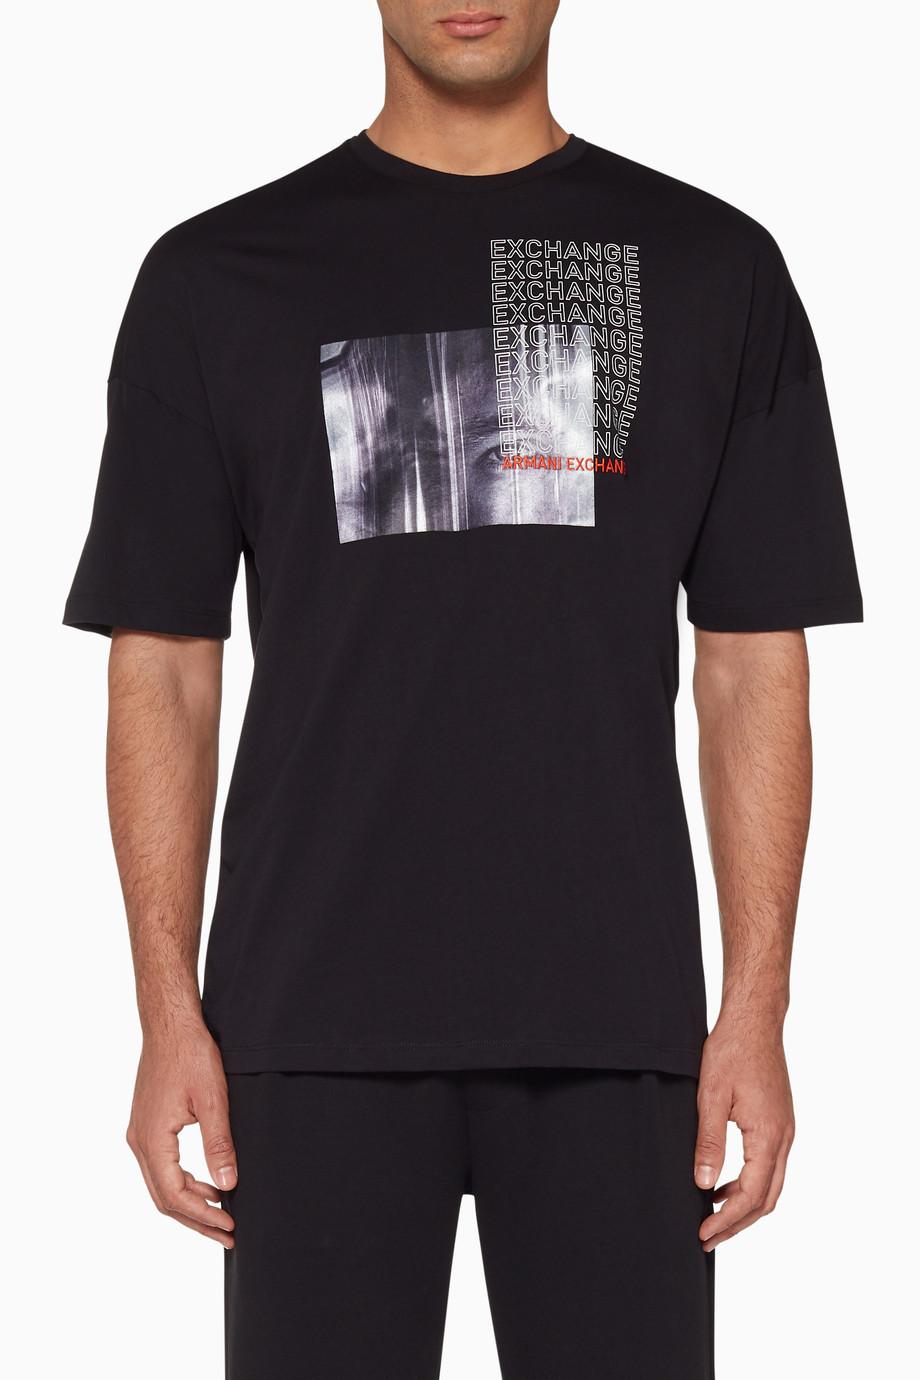 a83d5efe839 Shop Armani Exchange Black Black Graphic Print Logo T-Shirt for Men ...